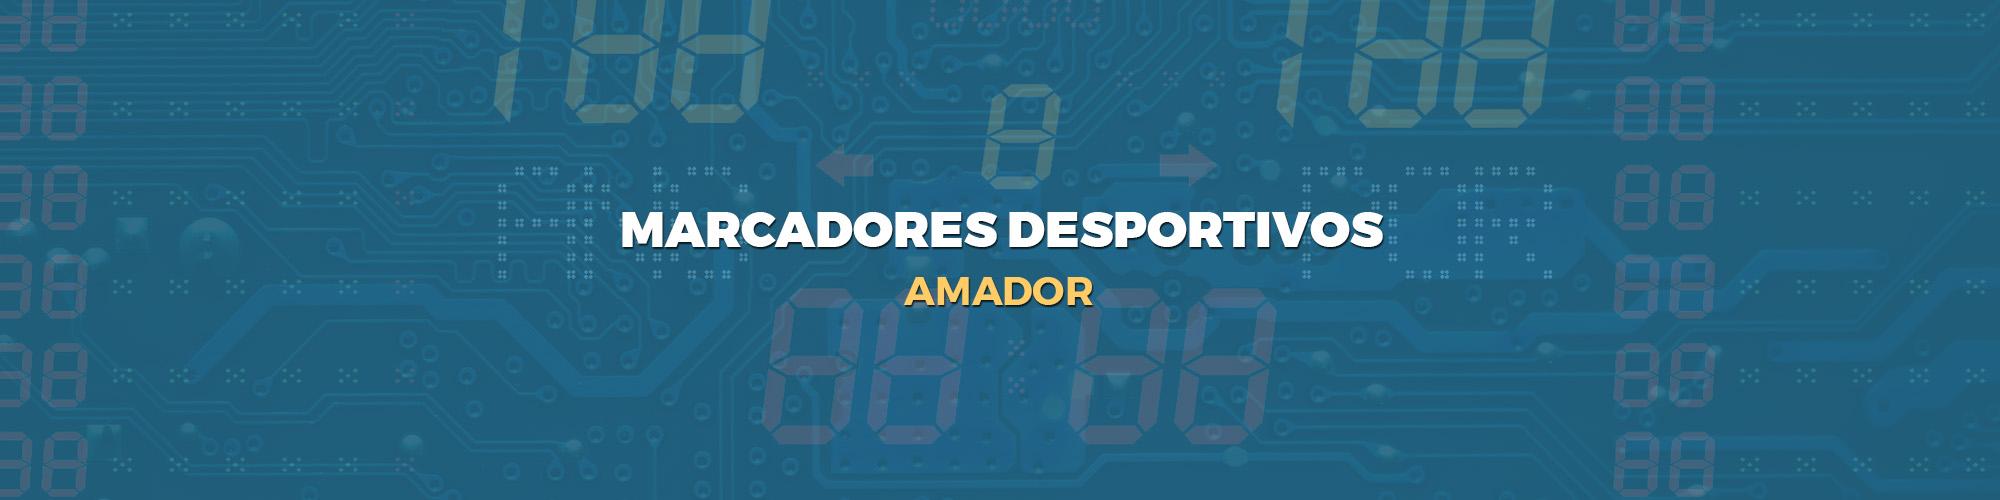 marcadores desportivos - Amador